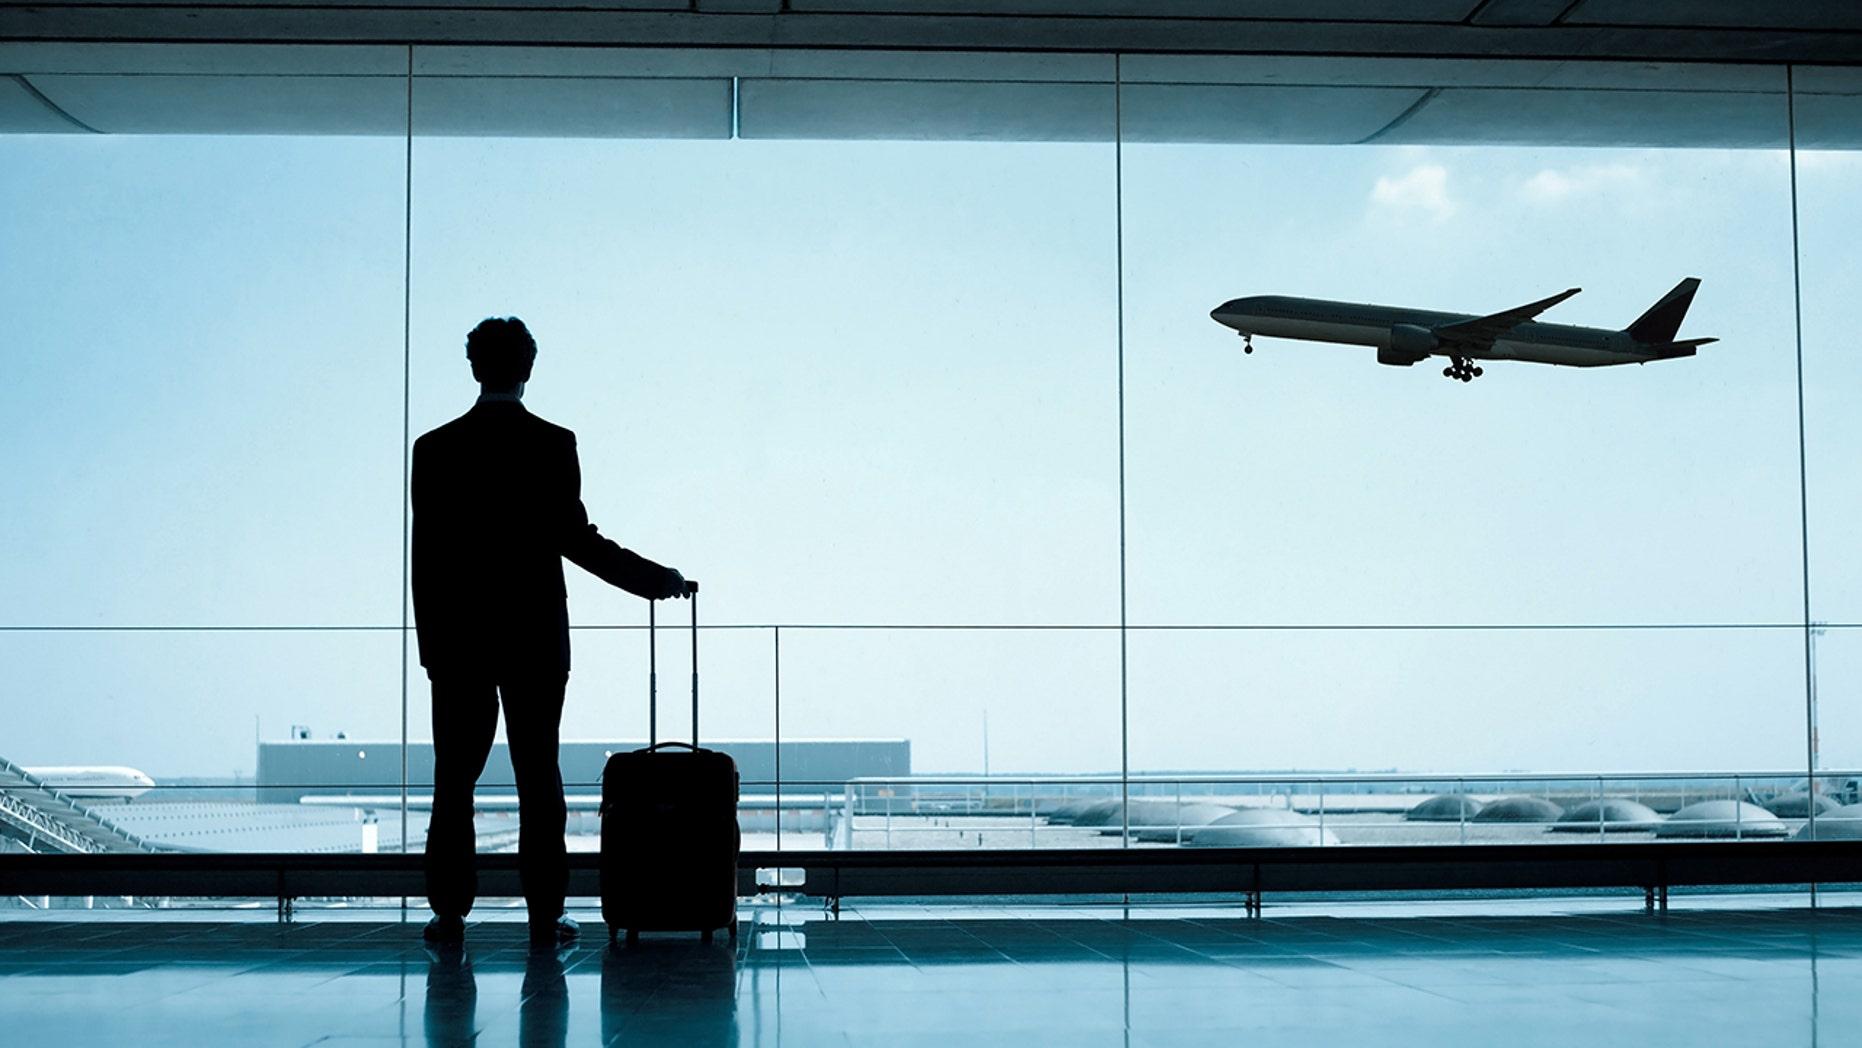 The incident occured at Chhatrapati Shivaji International Airport.